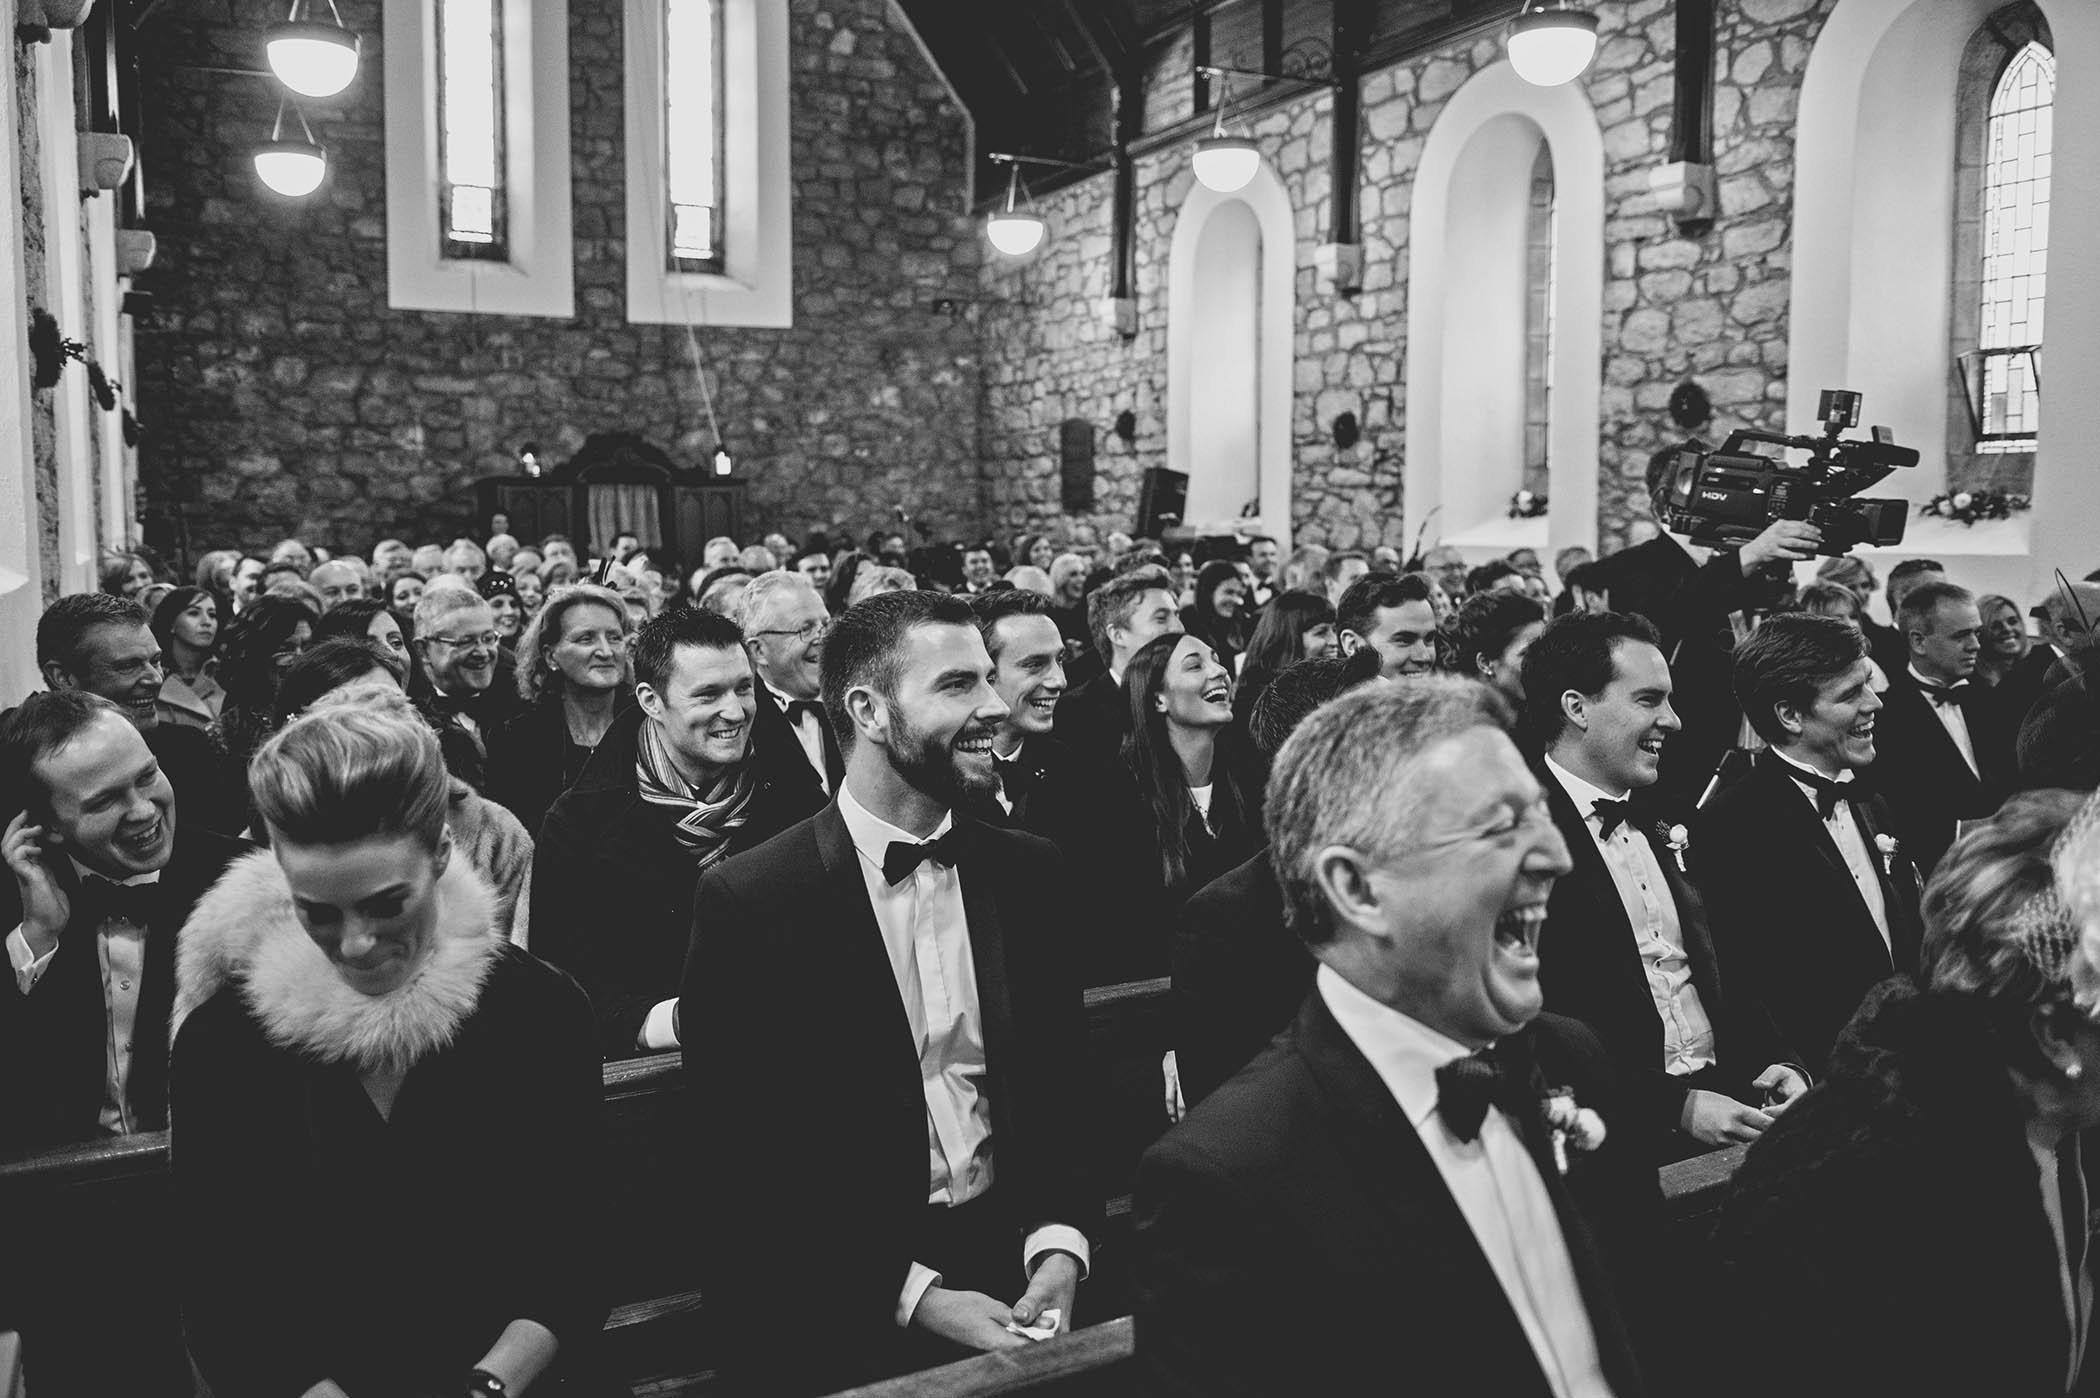 Powerscourt House wedding congregation 2014